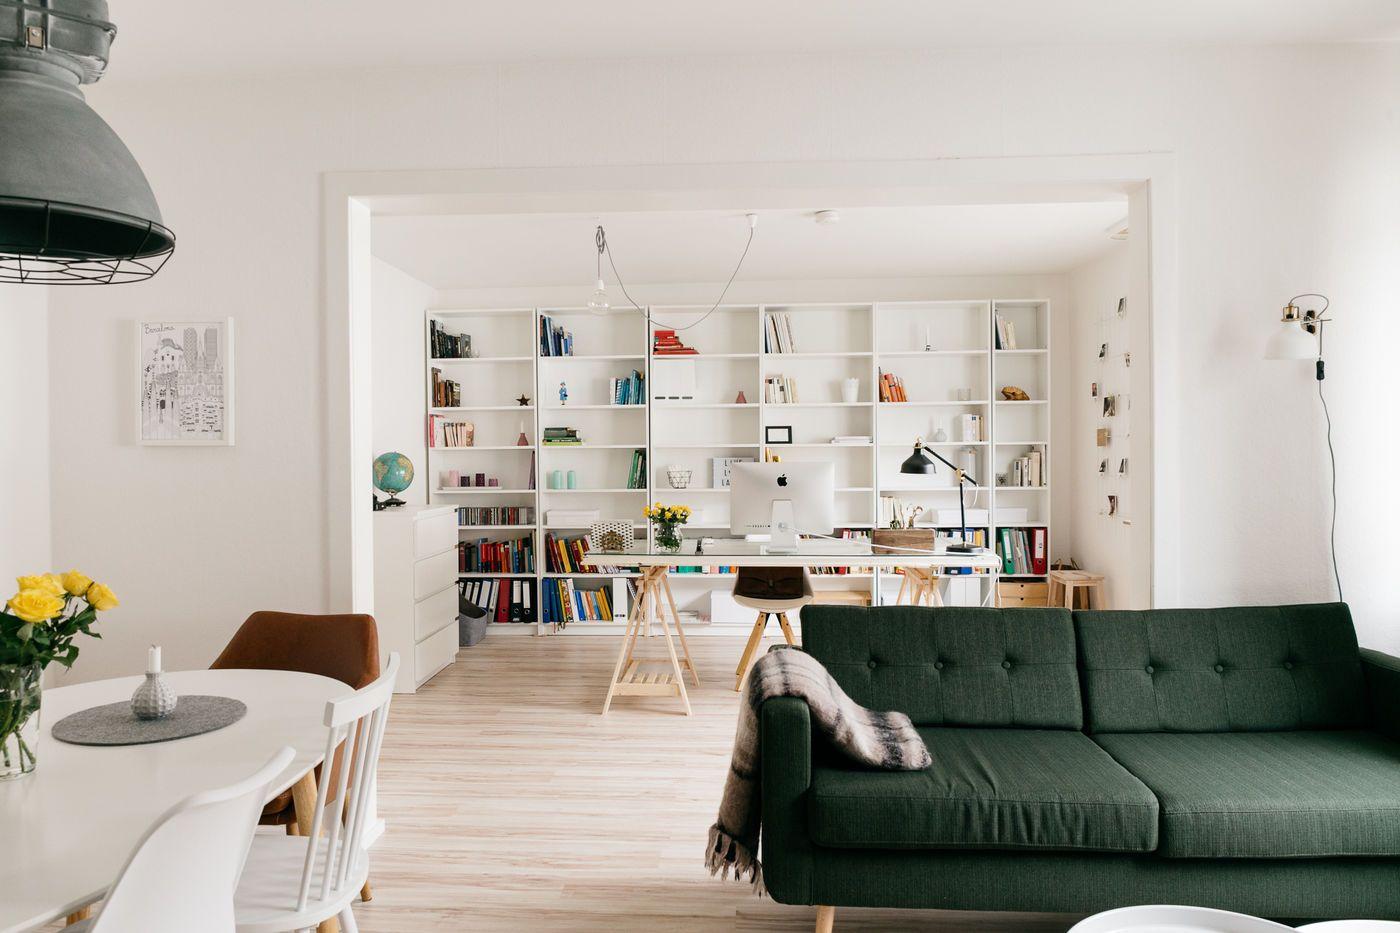 Kleiderschrank Rückwand Tapezieren: Ikea Billy